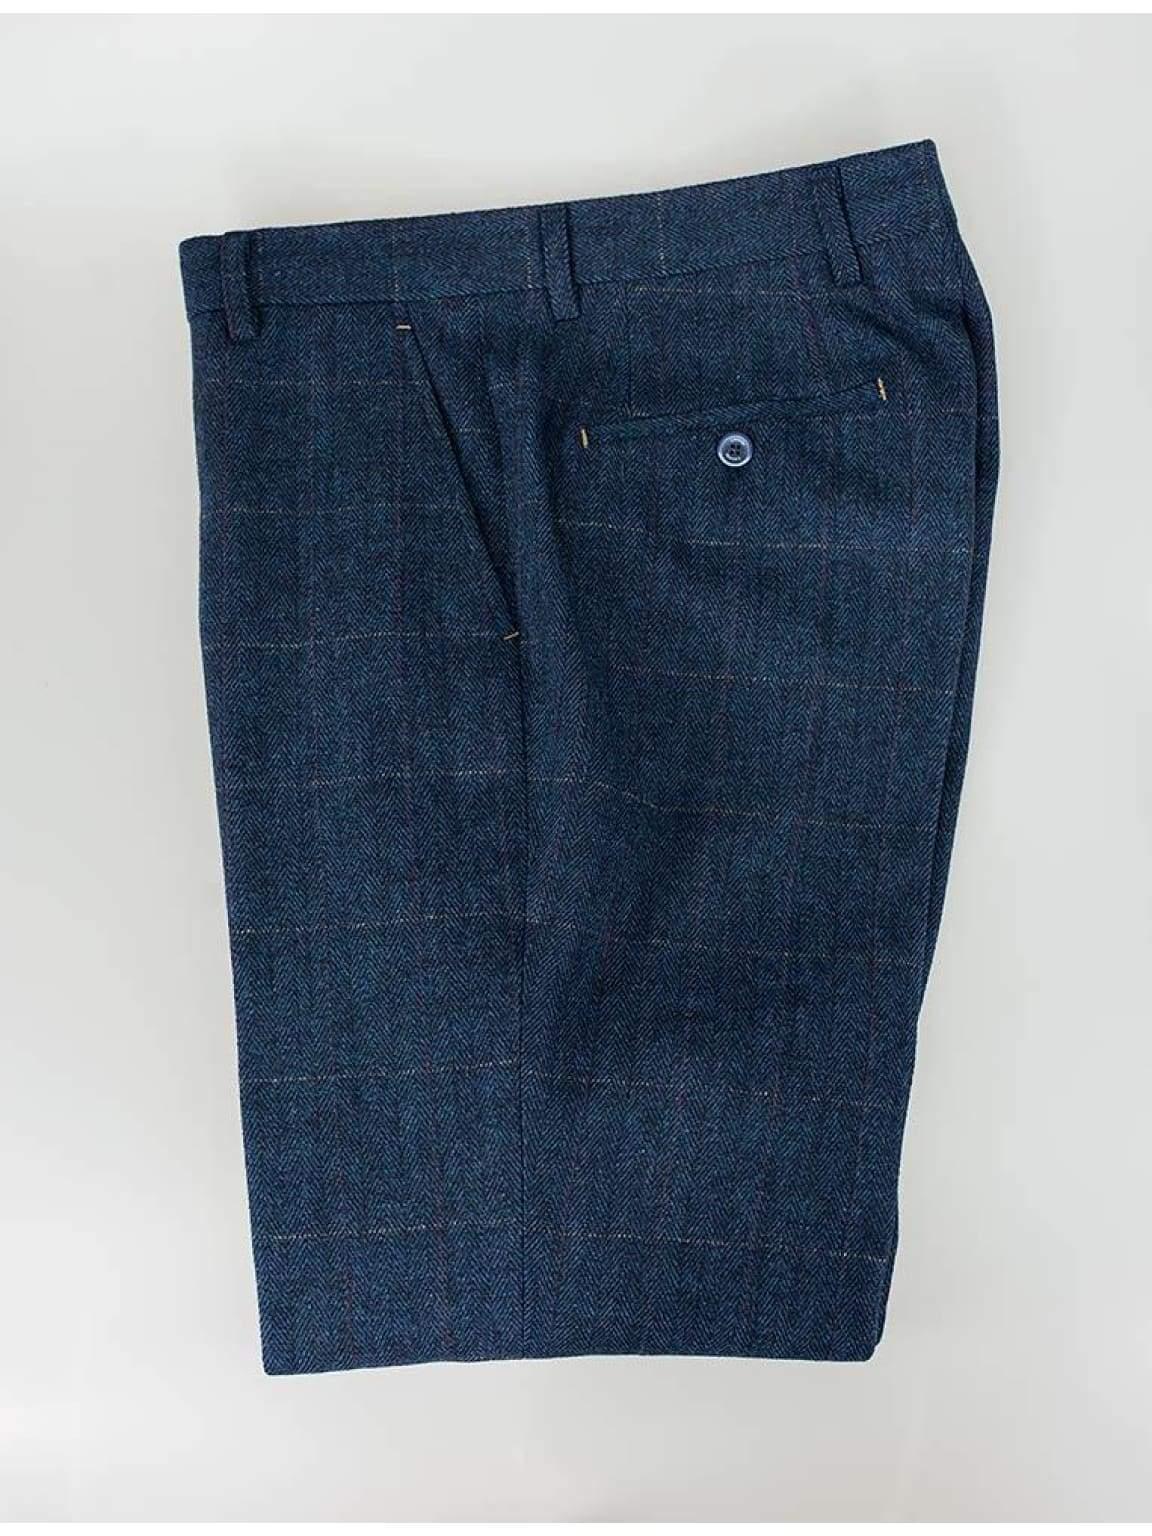 Cavani Carnegi Mens Blue Slim Fit tweed Check Trousers - 30R - Suit & Tailoring